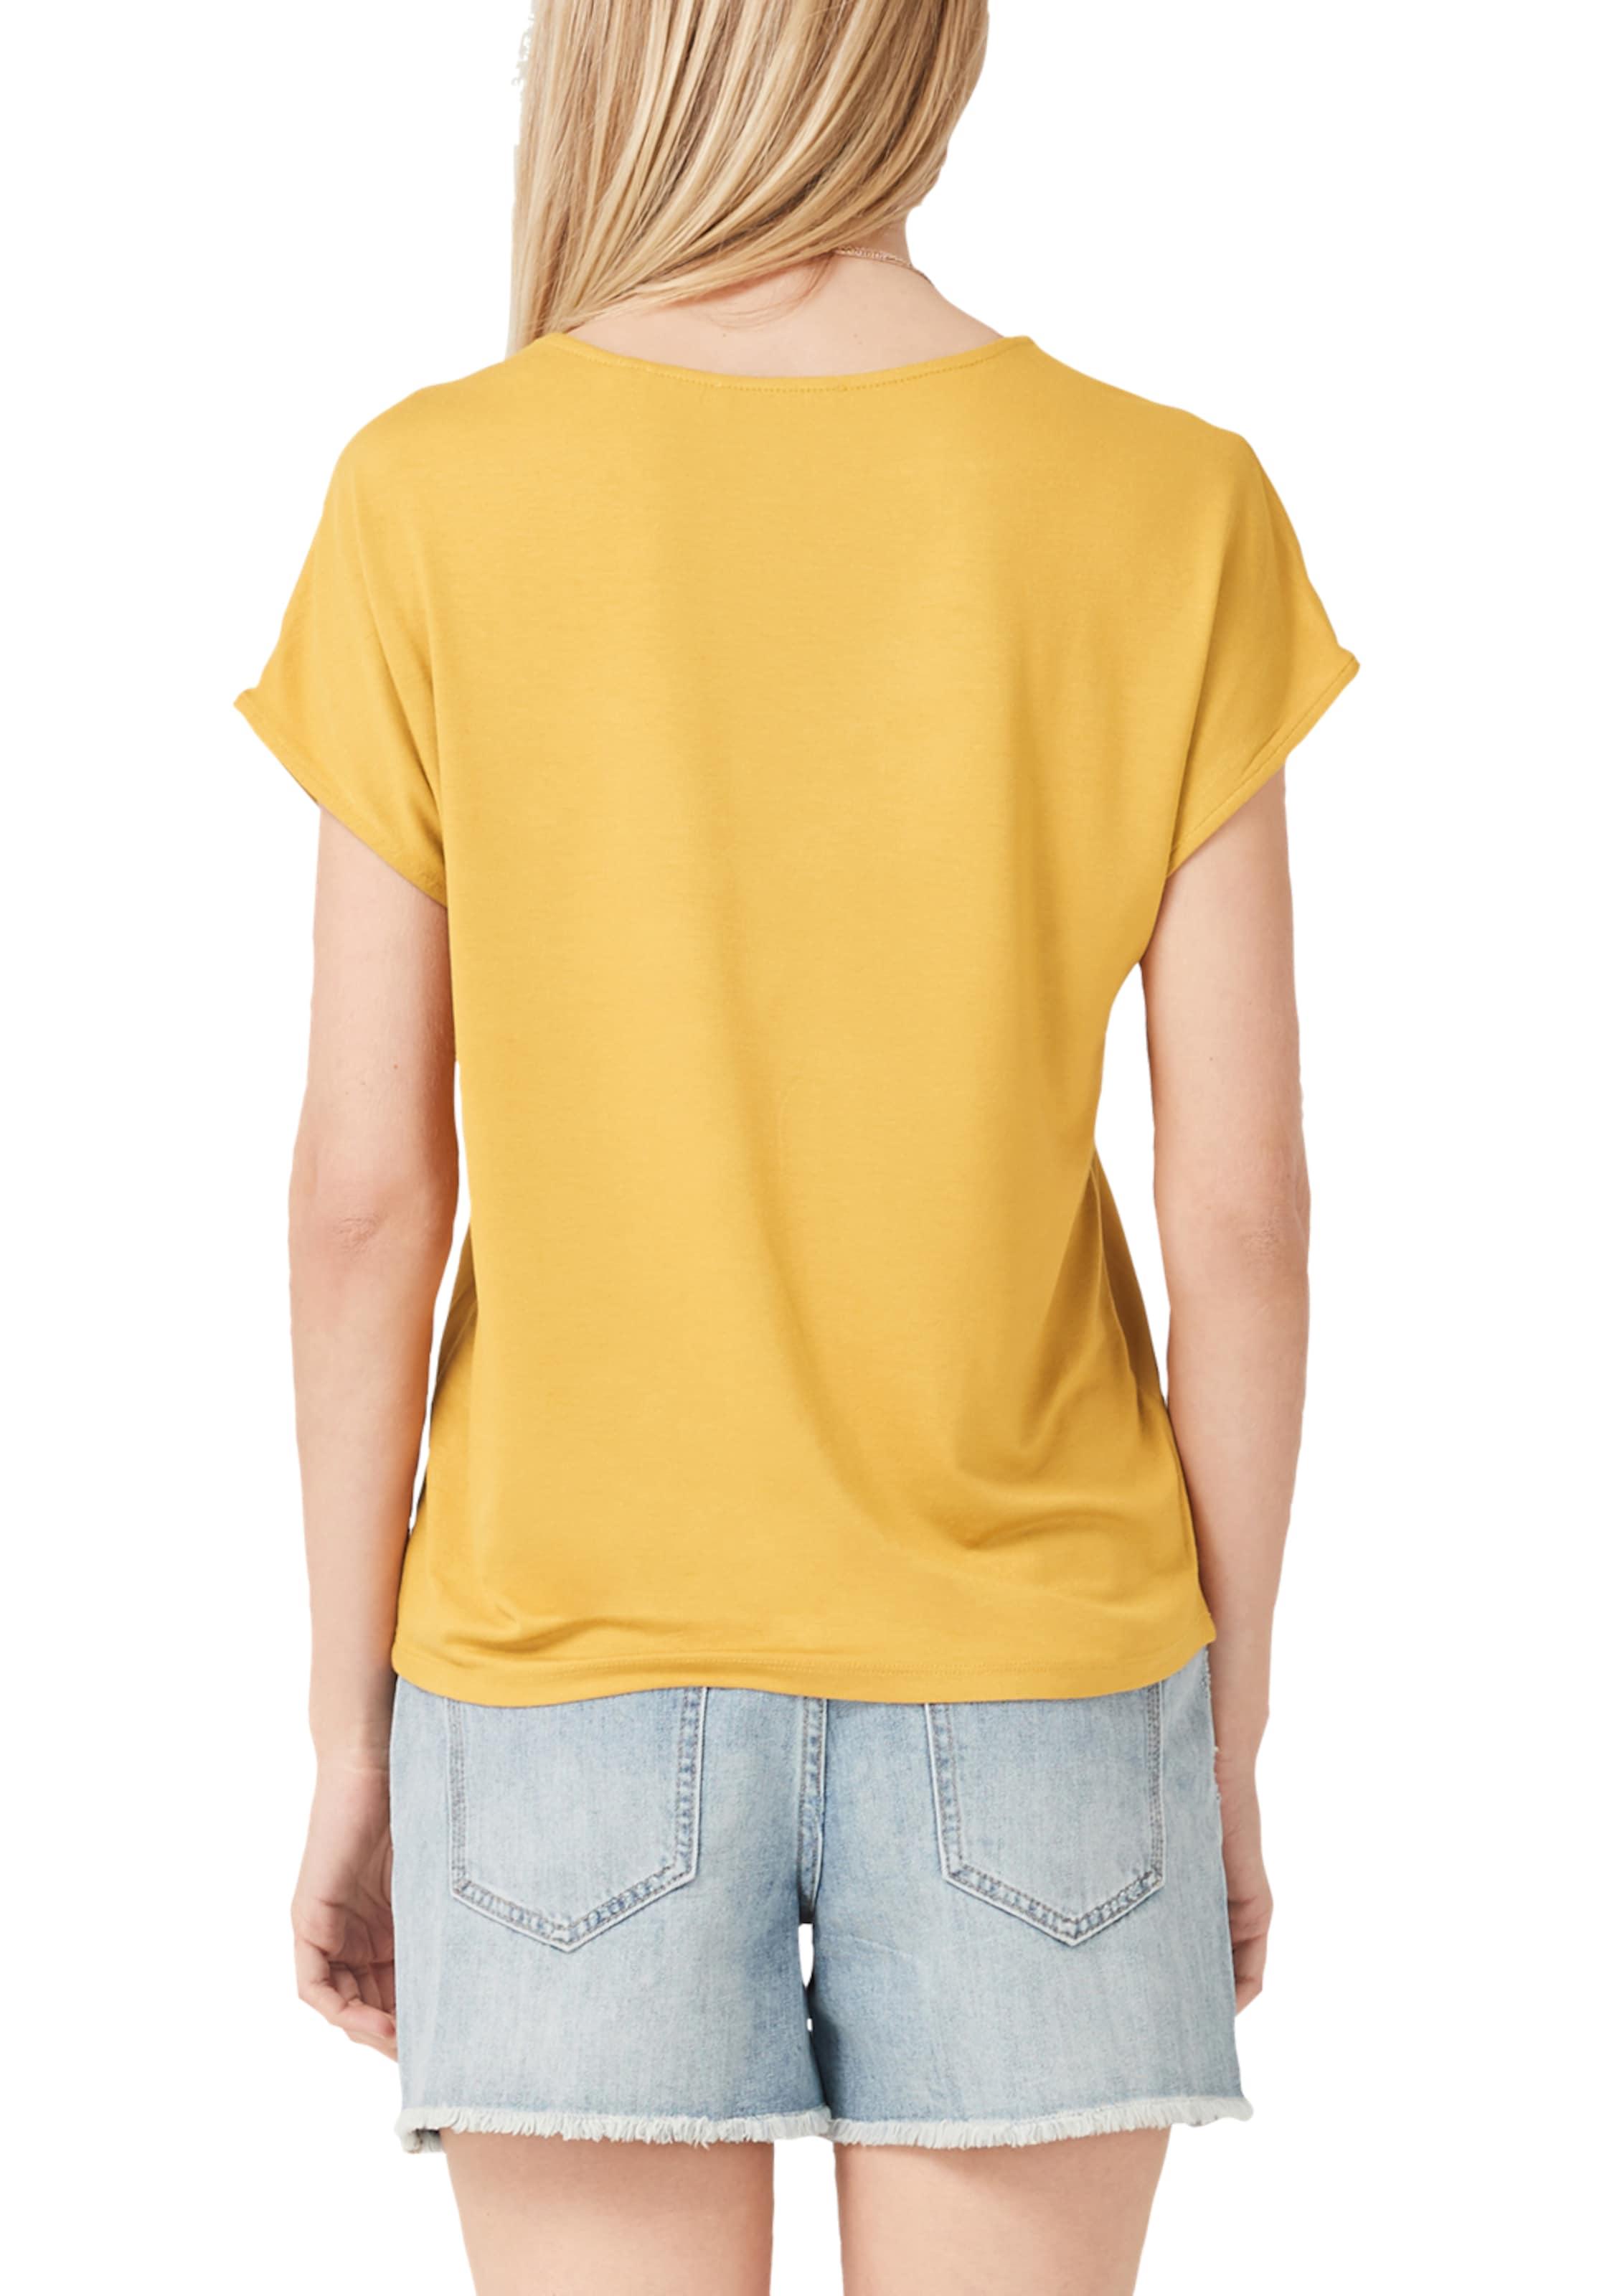 Label oliver Shirt Red In S Goldgelb yb7gYf6v